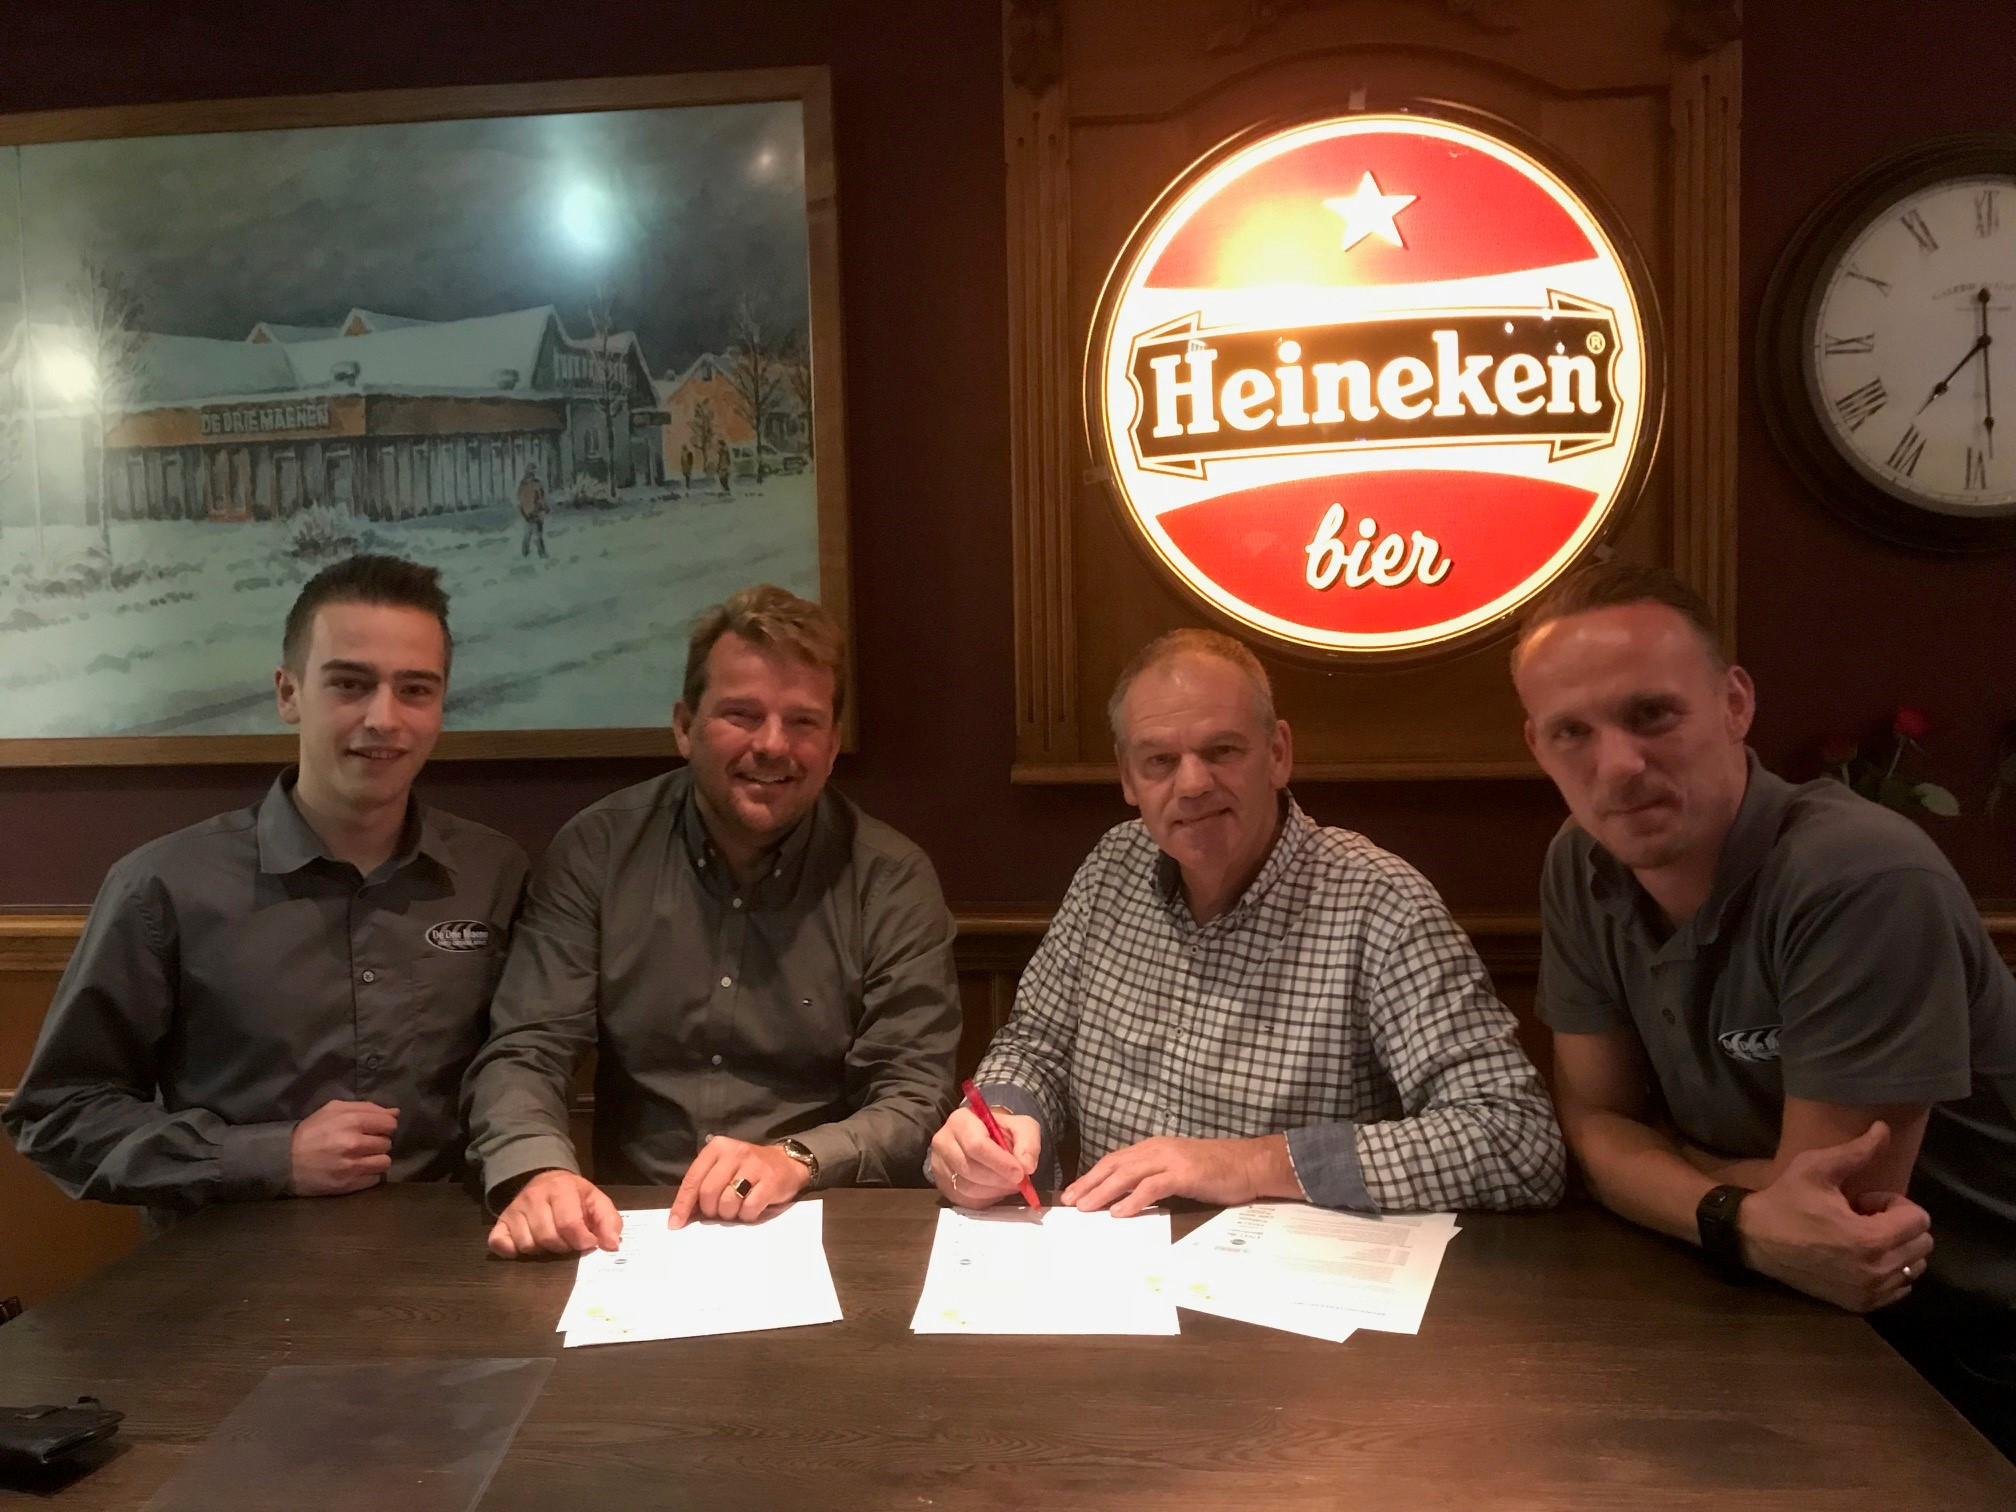 Ook Bar De Drie Maenen gaat Spirit sponsoren